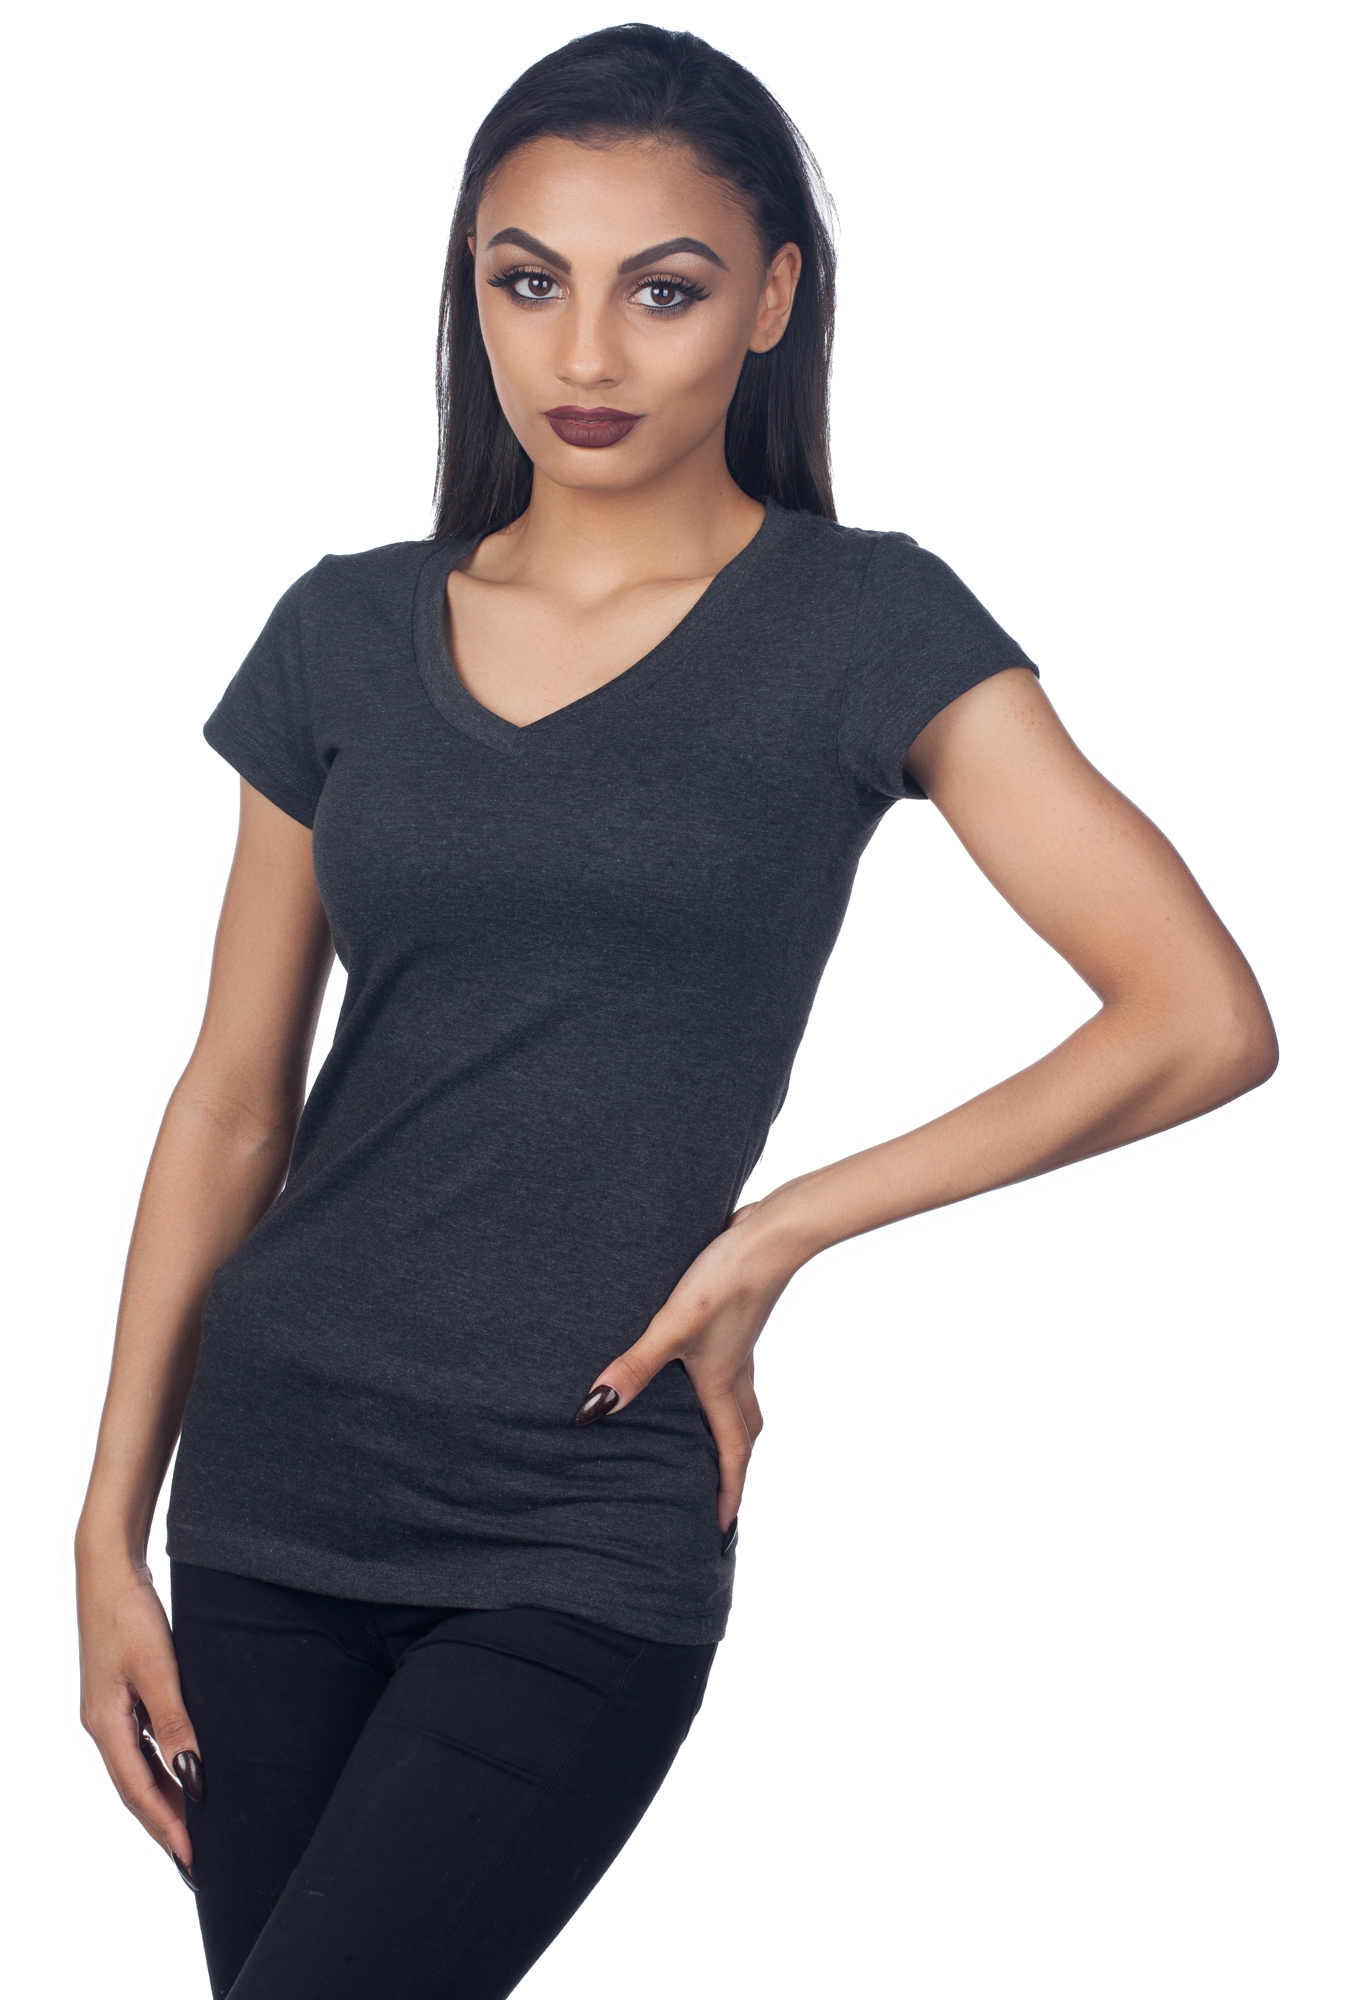 Tresics Women's V-Neck T-Shirt SC3263A